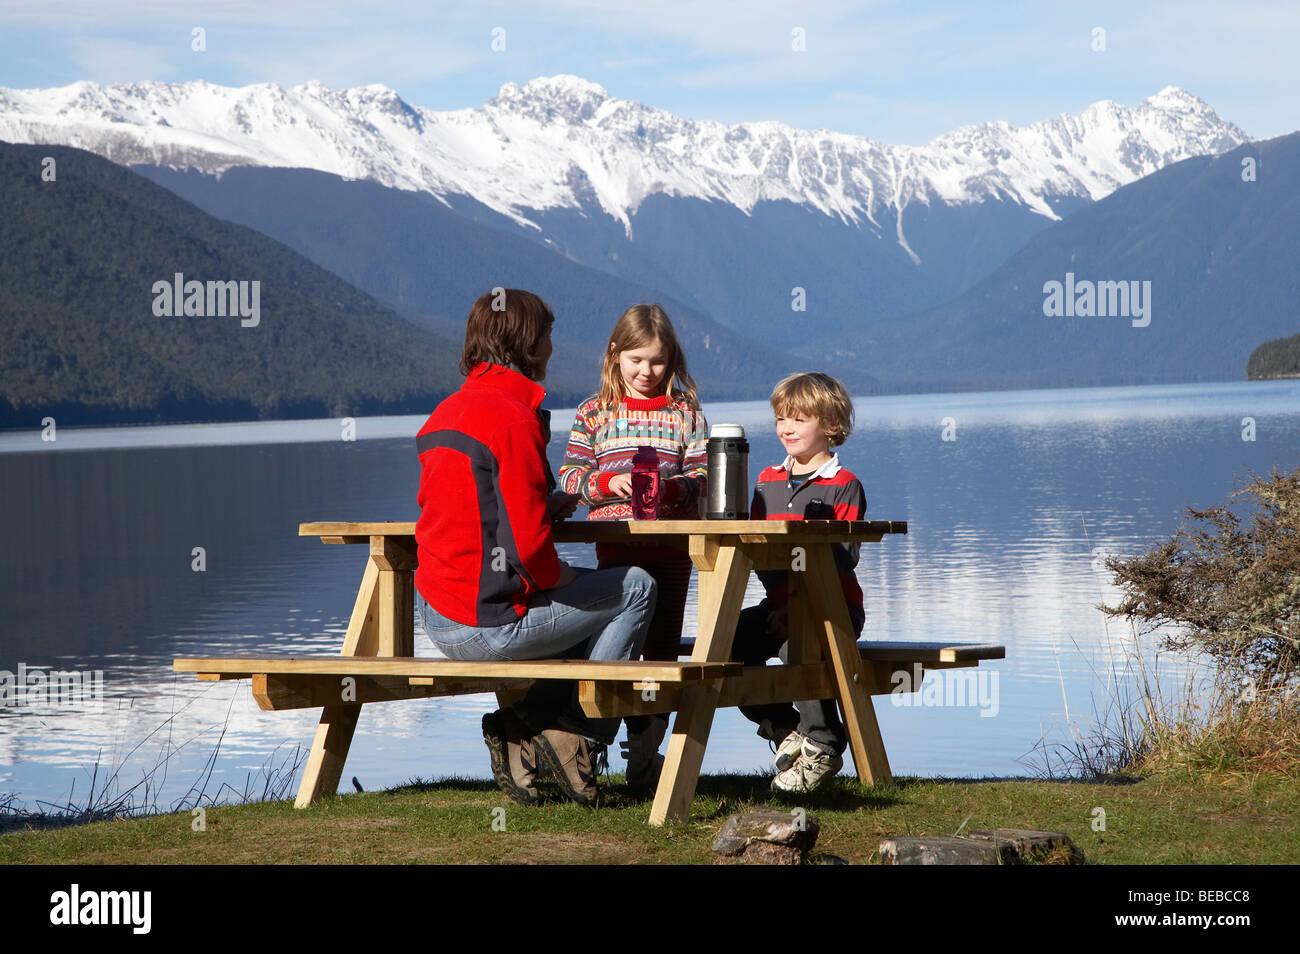 Family Picnic, Lake Rotoroa, Nelson Lakes National Park, Tasman District, South Island, New Zealand - Stock Image